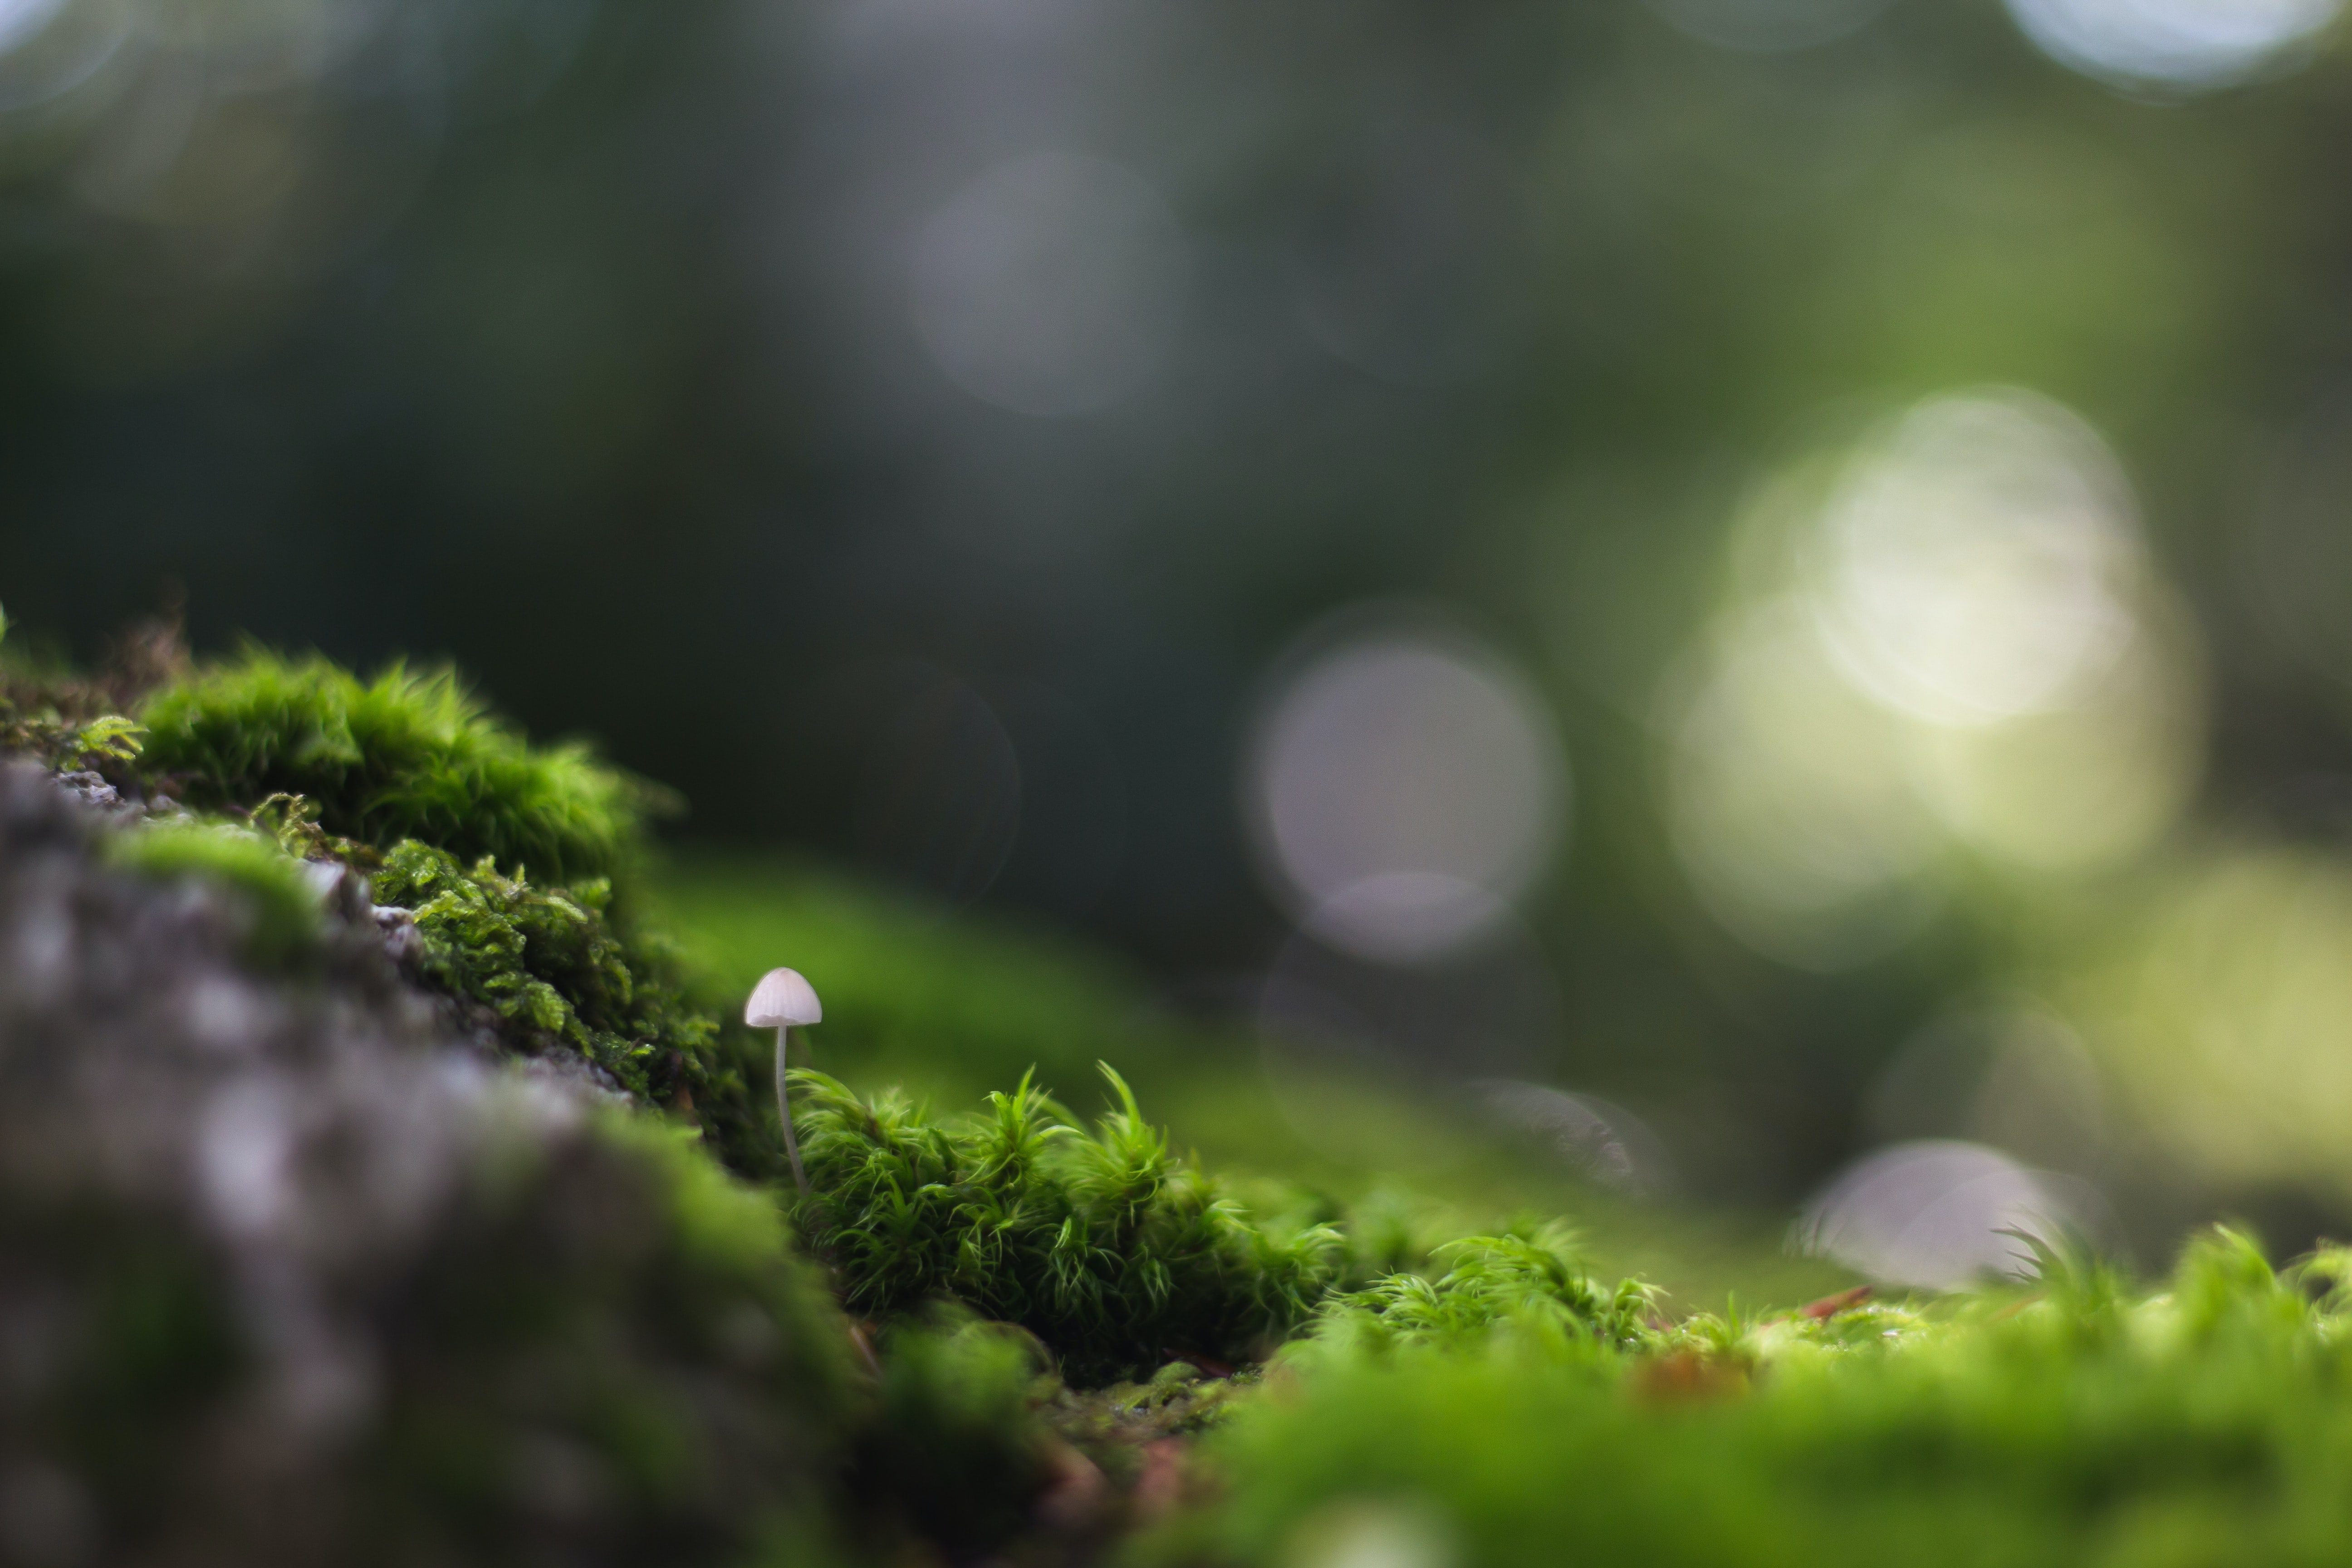 selective photography of white mushroom near green grass